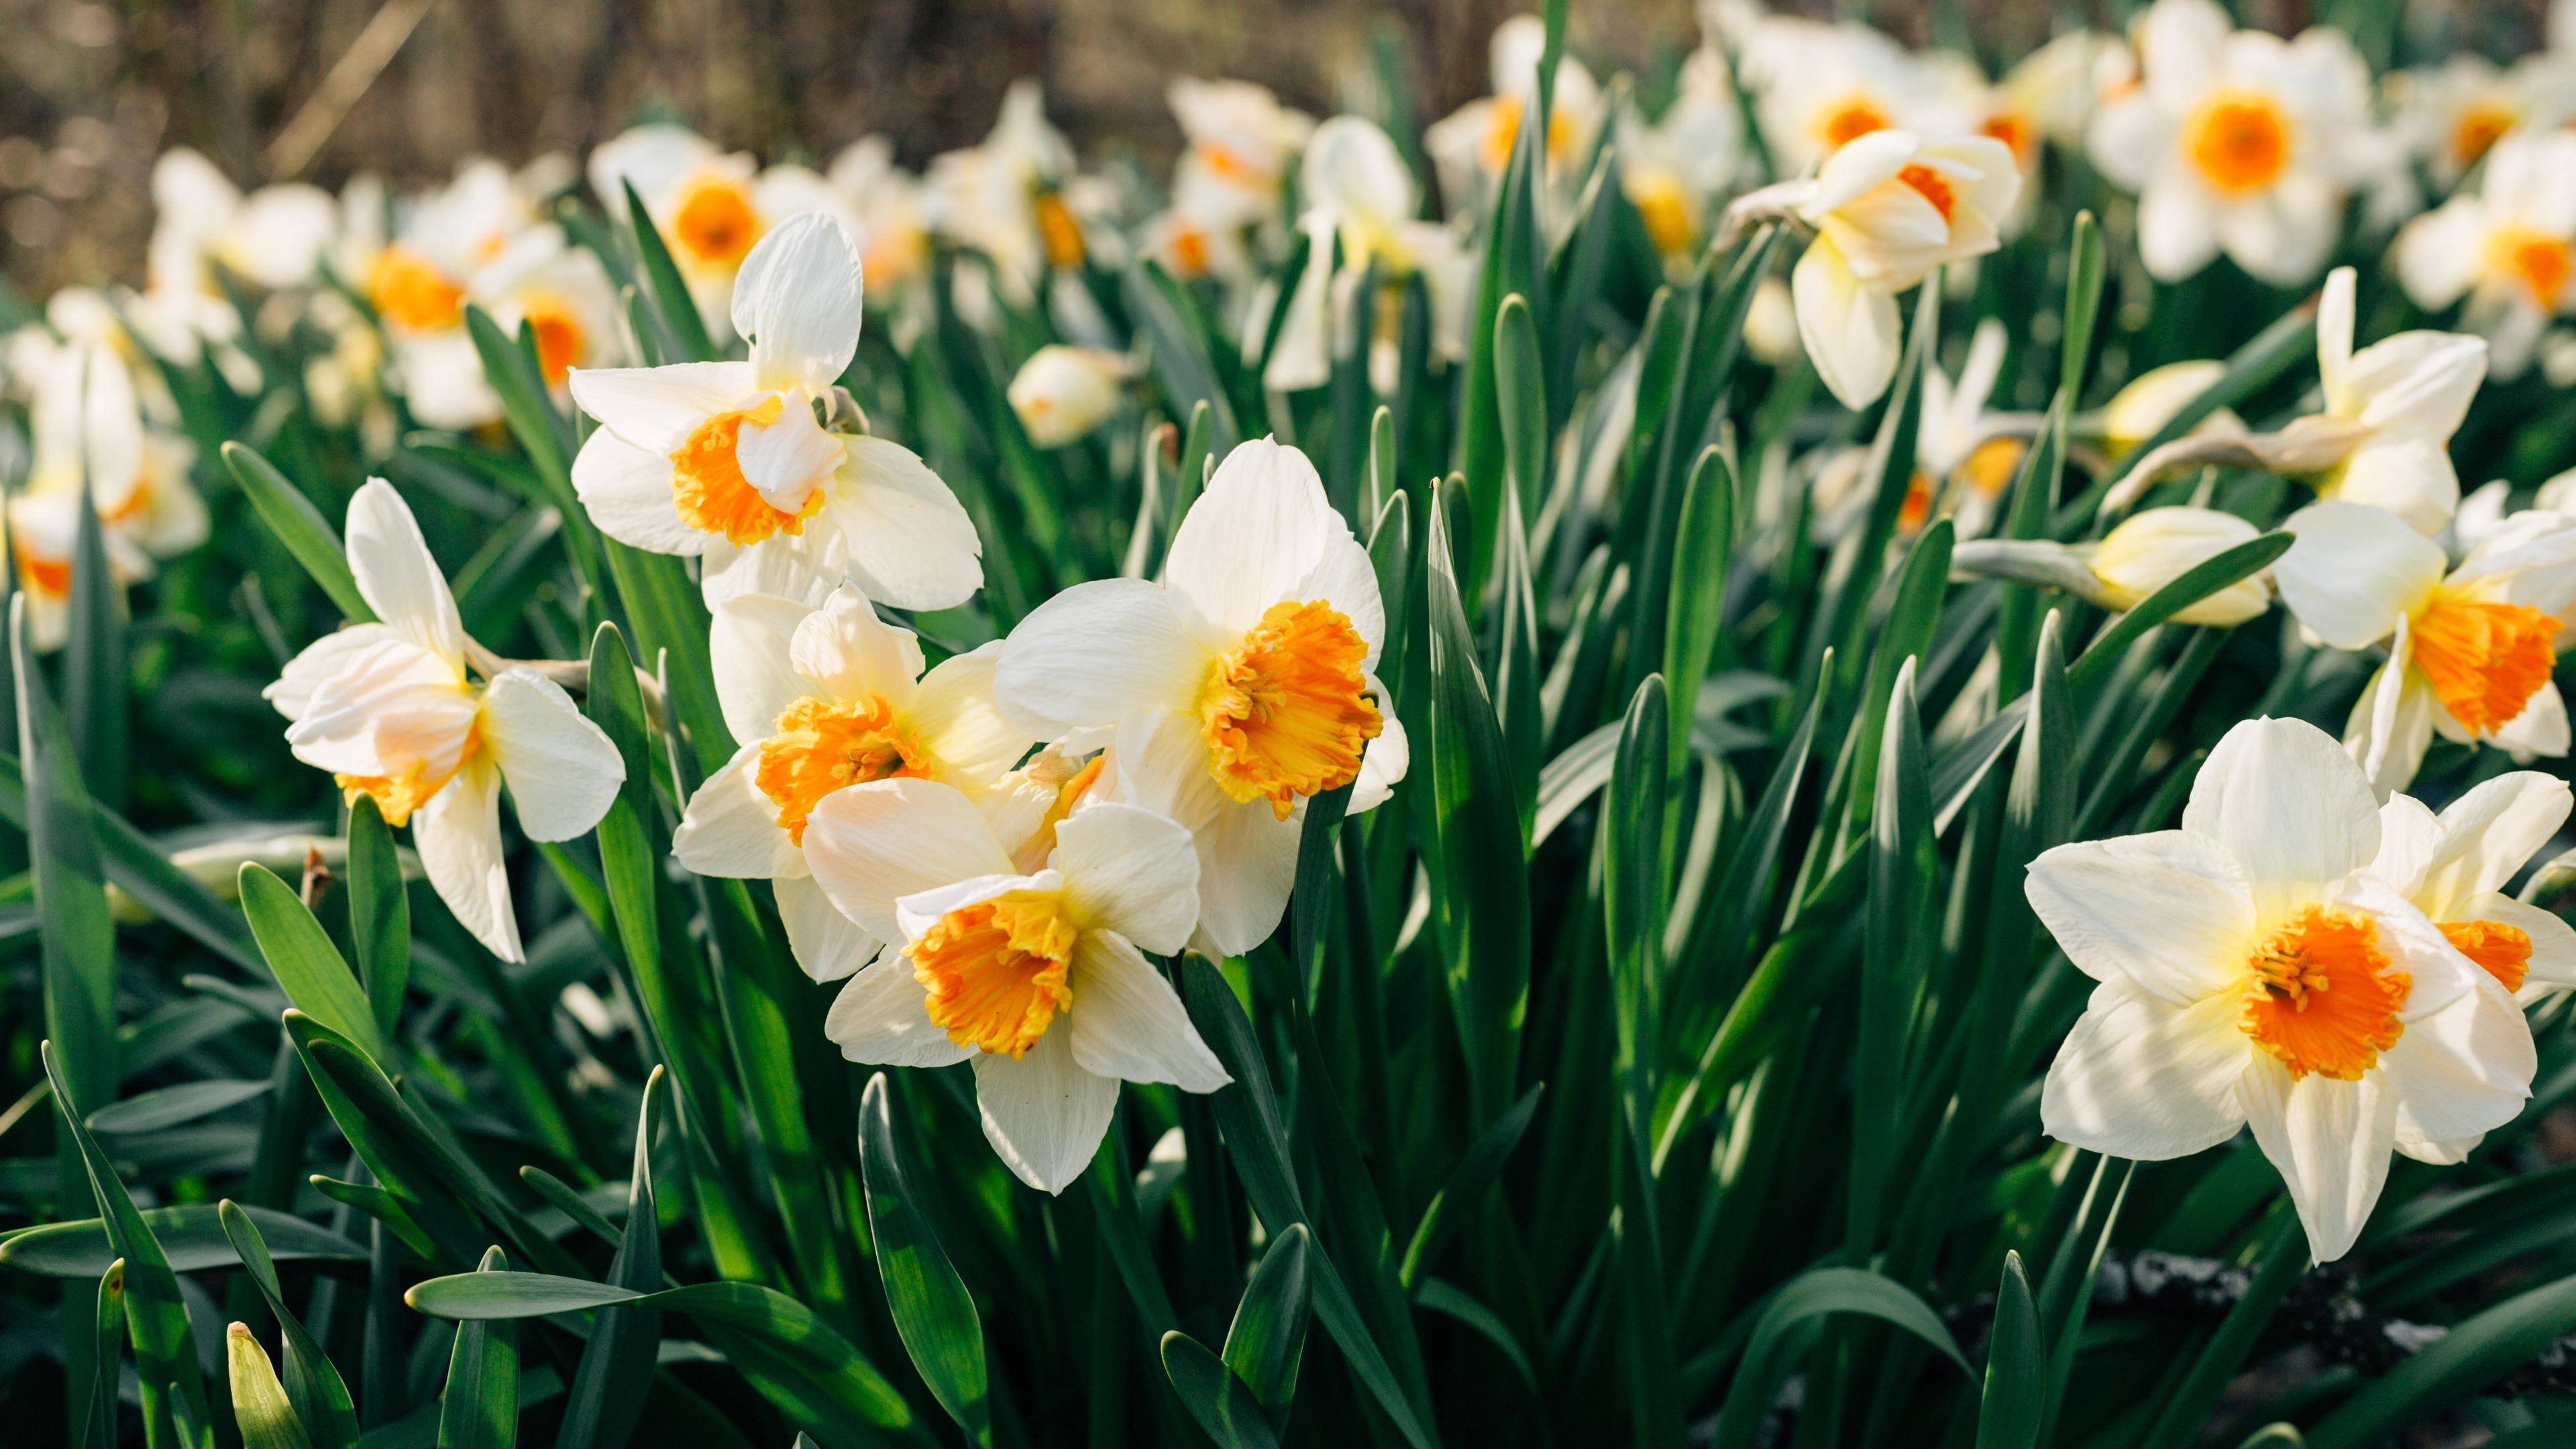 daffodils flowers flower bed 4k 1540064357 - daffodils, flowers, flower bed 4k - Flowers, flower bed, daffodils